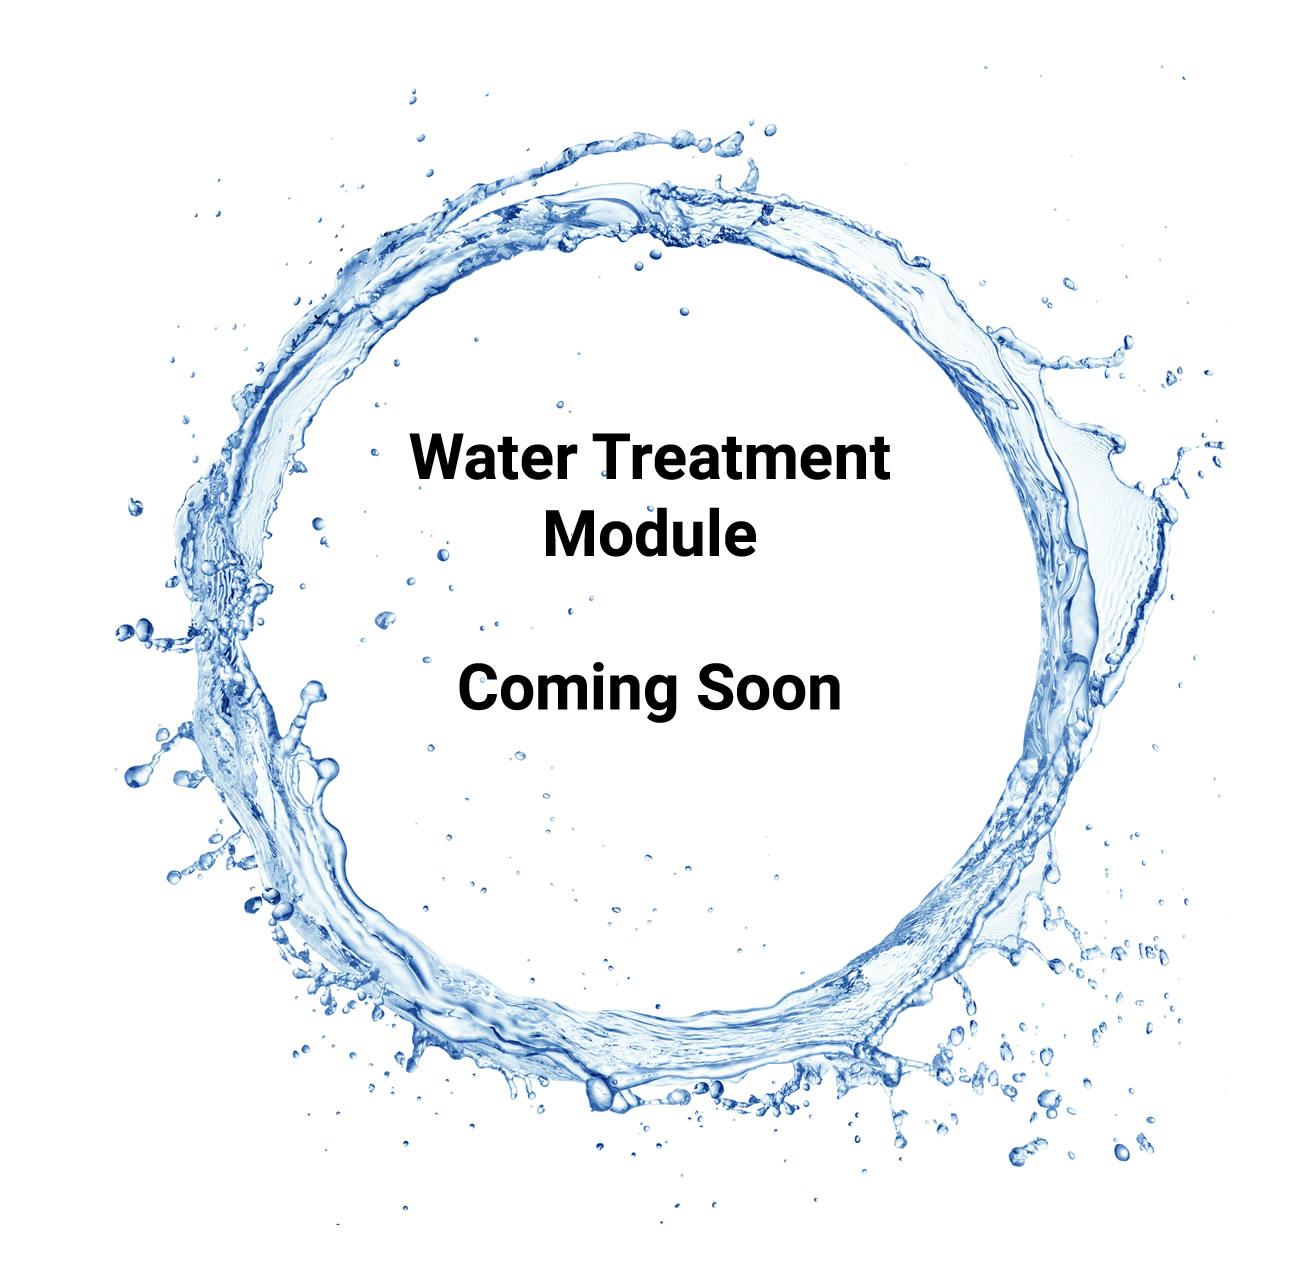 Water Treatment Module